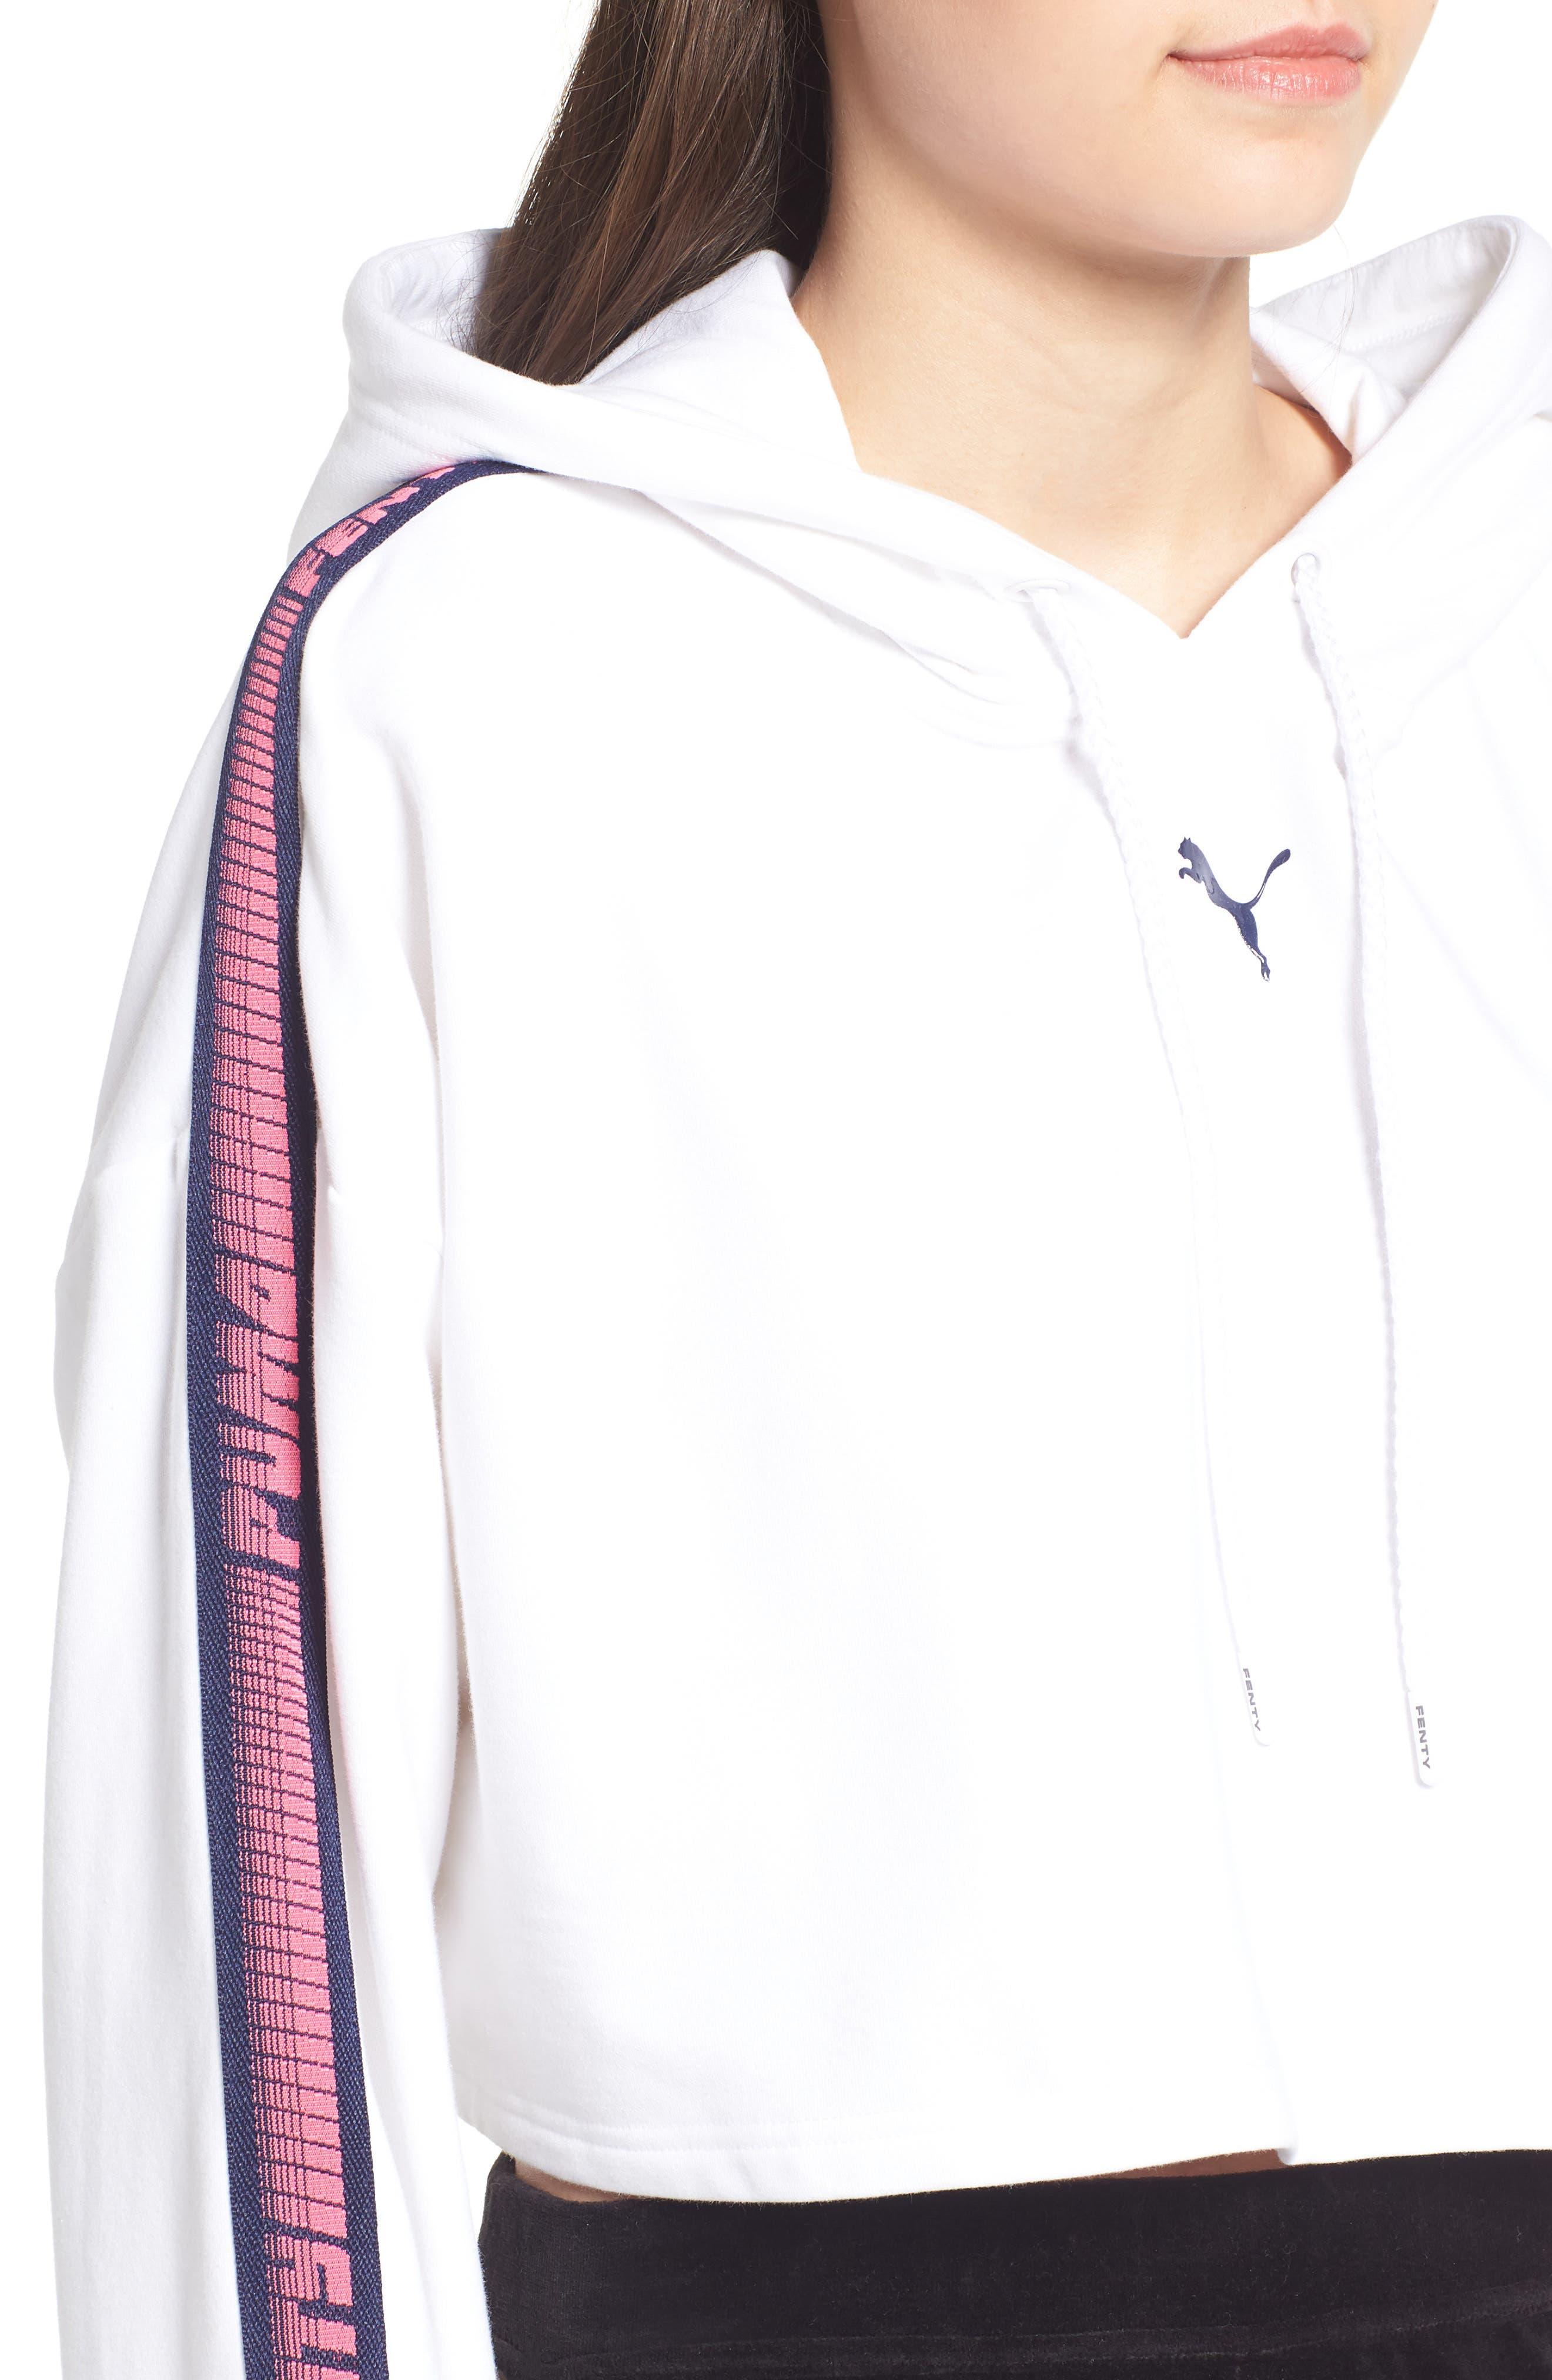 FENTY PUMA by Rihanna Hooded Crop Sweatshirt,                             Alternate thumbnail 4, color,